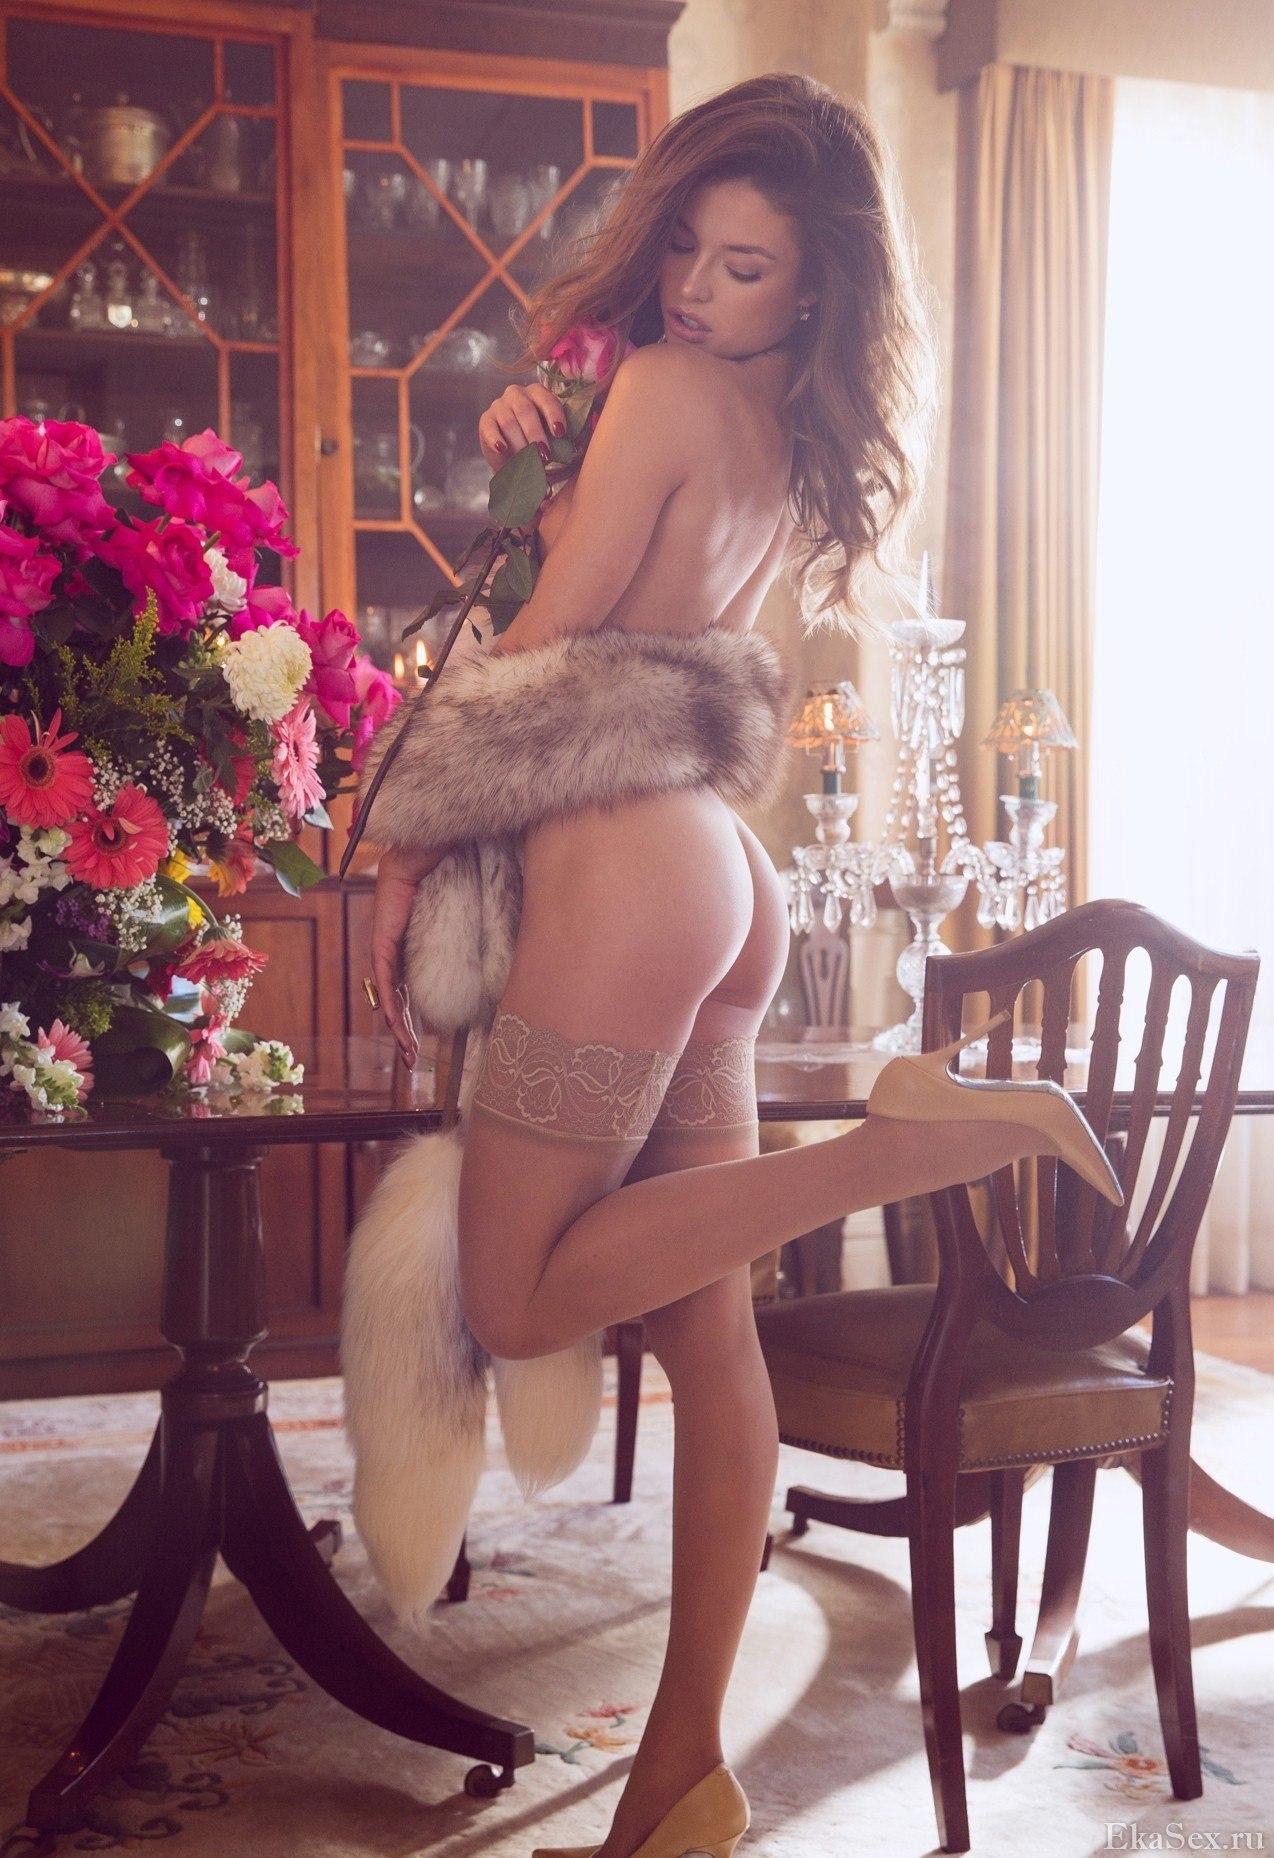 фото проститутки Аленочка из города Екатеринбург